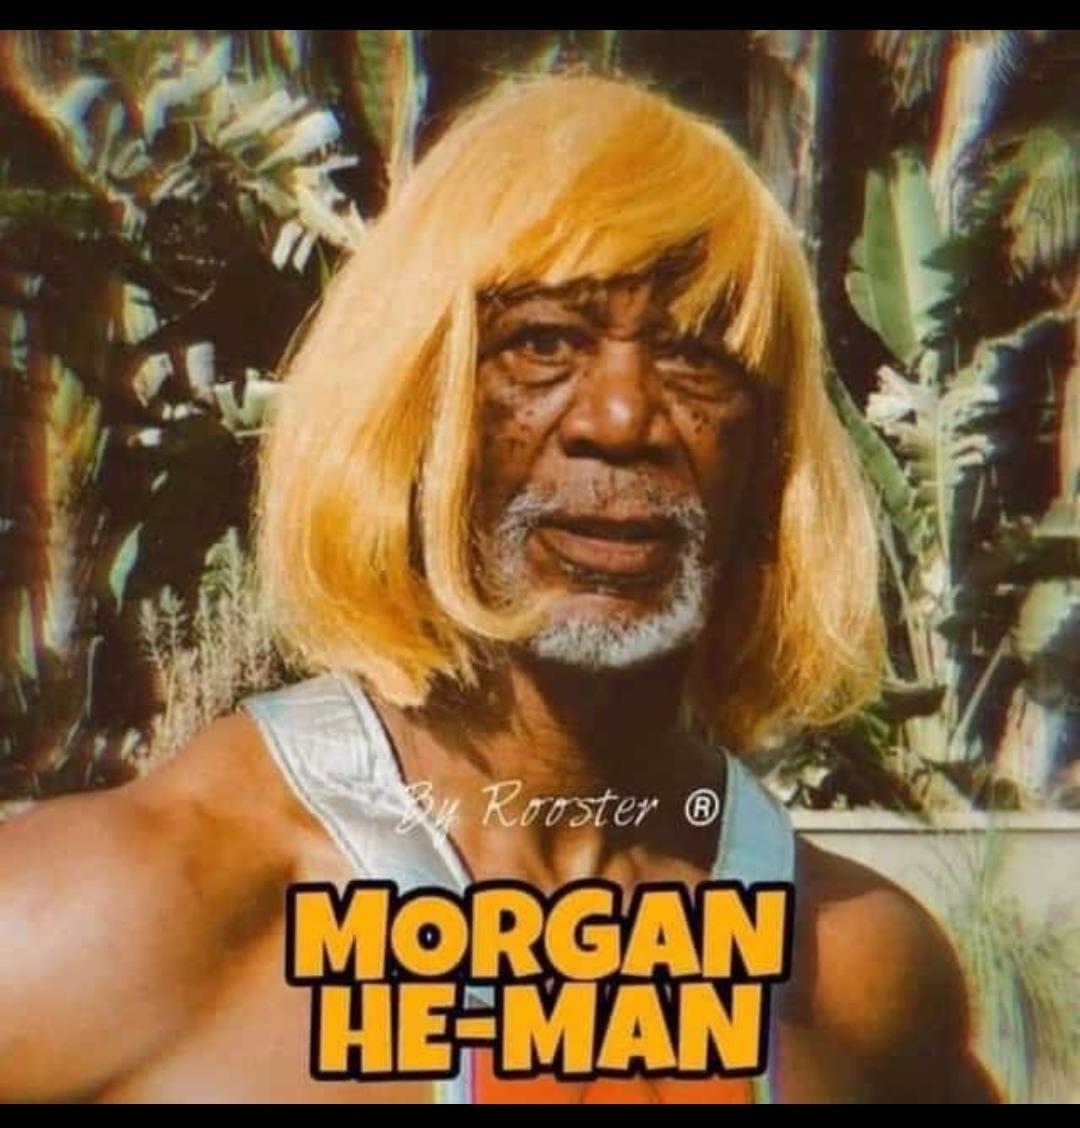 Morgan he-man - meme